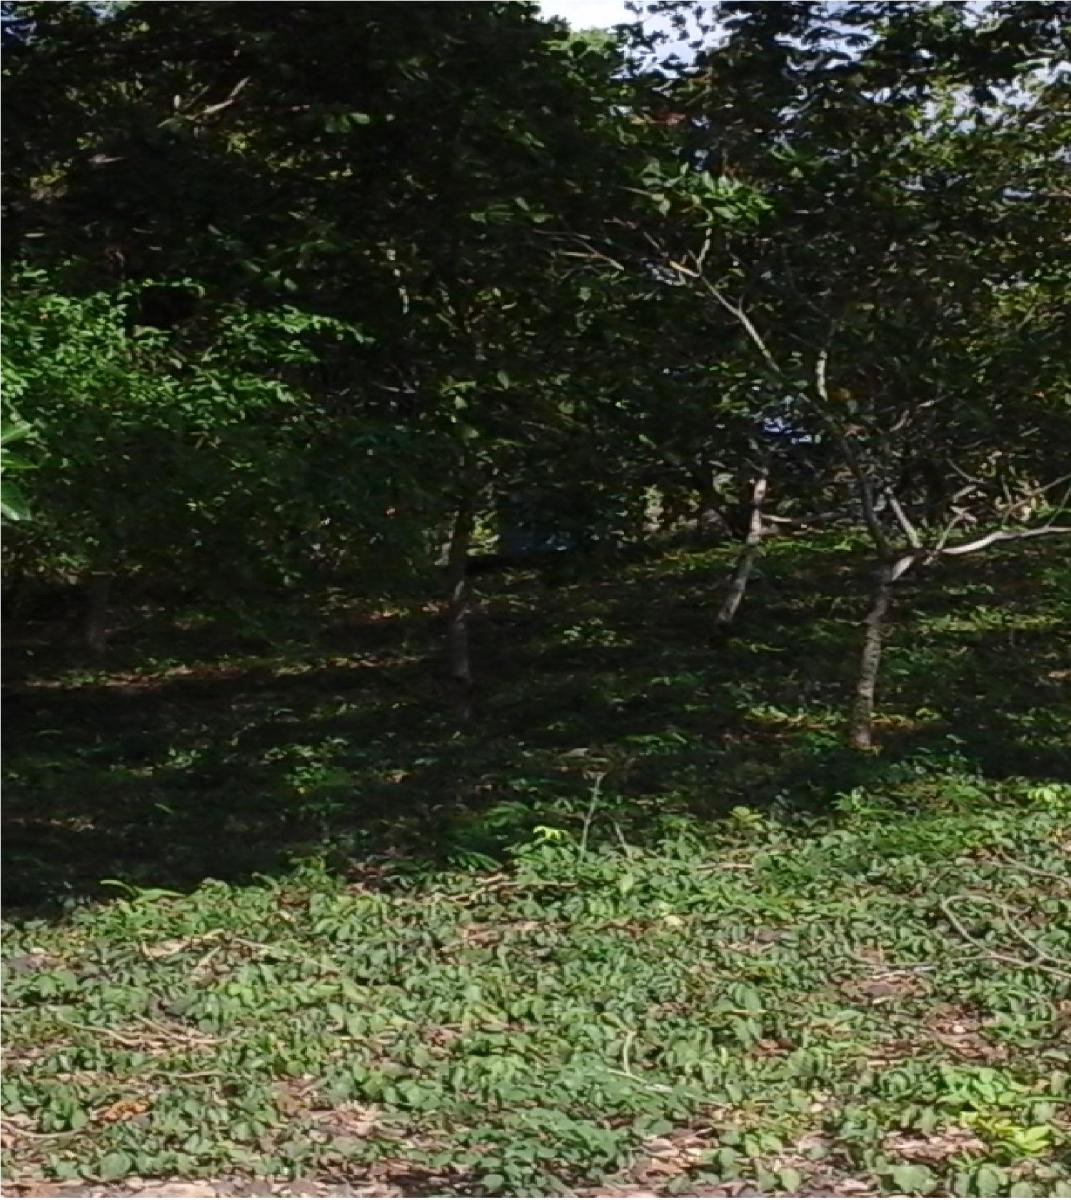 terreno 24x30, para venda no bairro gurupi em teresina - pi